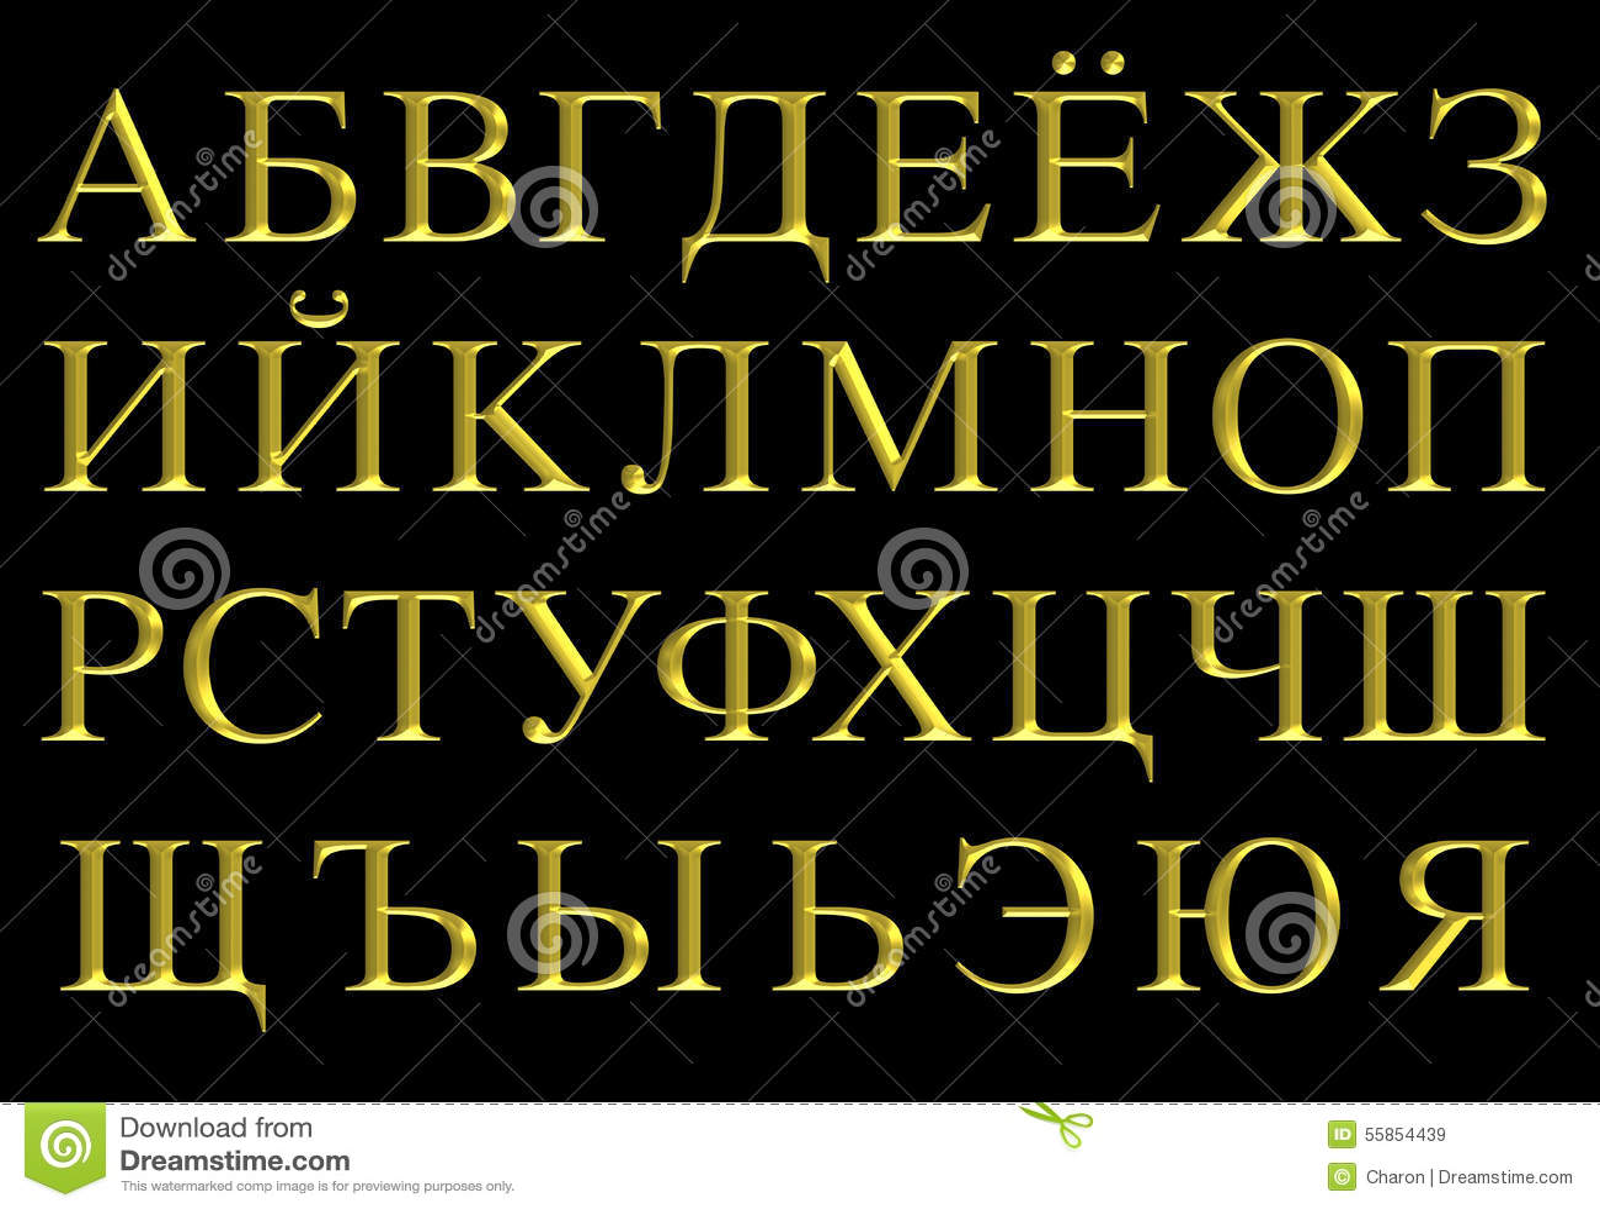 Golden Engraved Russian Alphabet Letter Set Stock Photo - Image ...